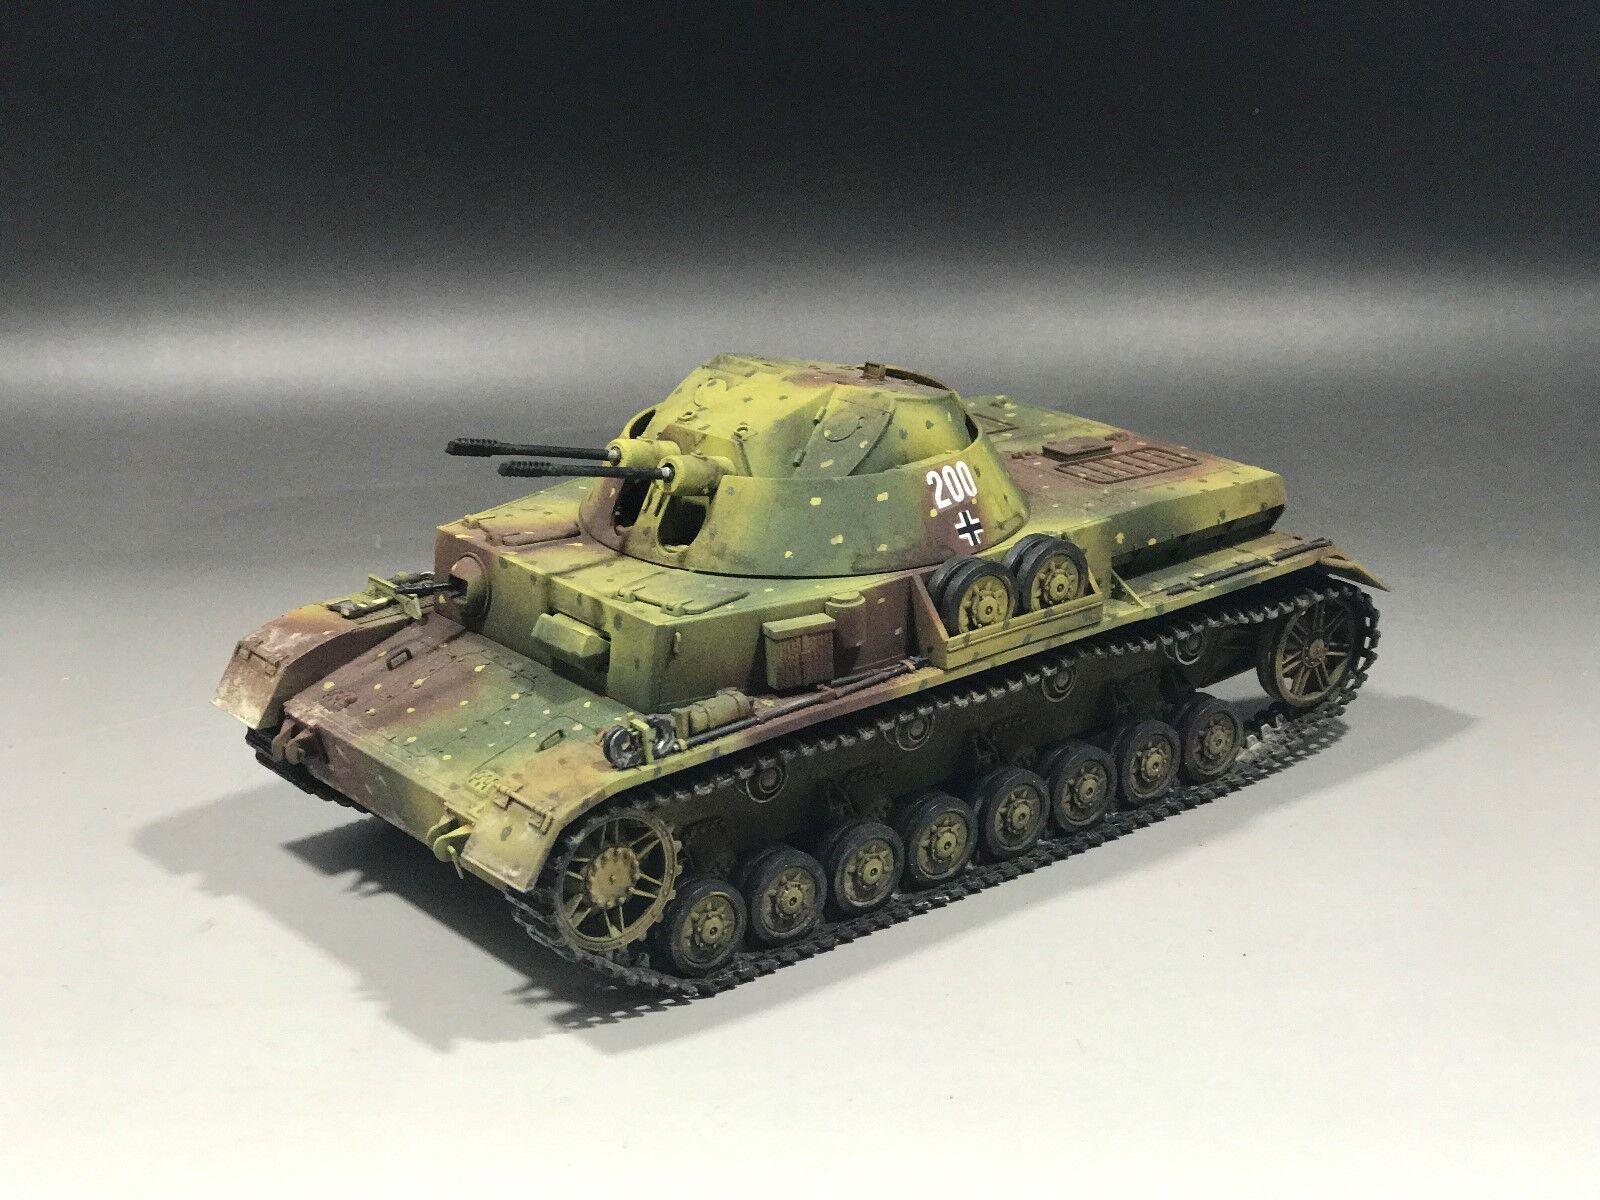 1/35 construido alemán Flakpanzer IV (3 cm) Kugelblitz